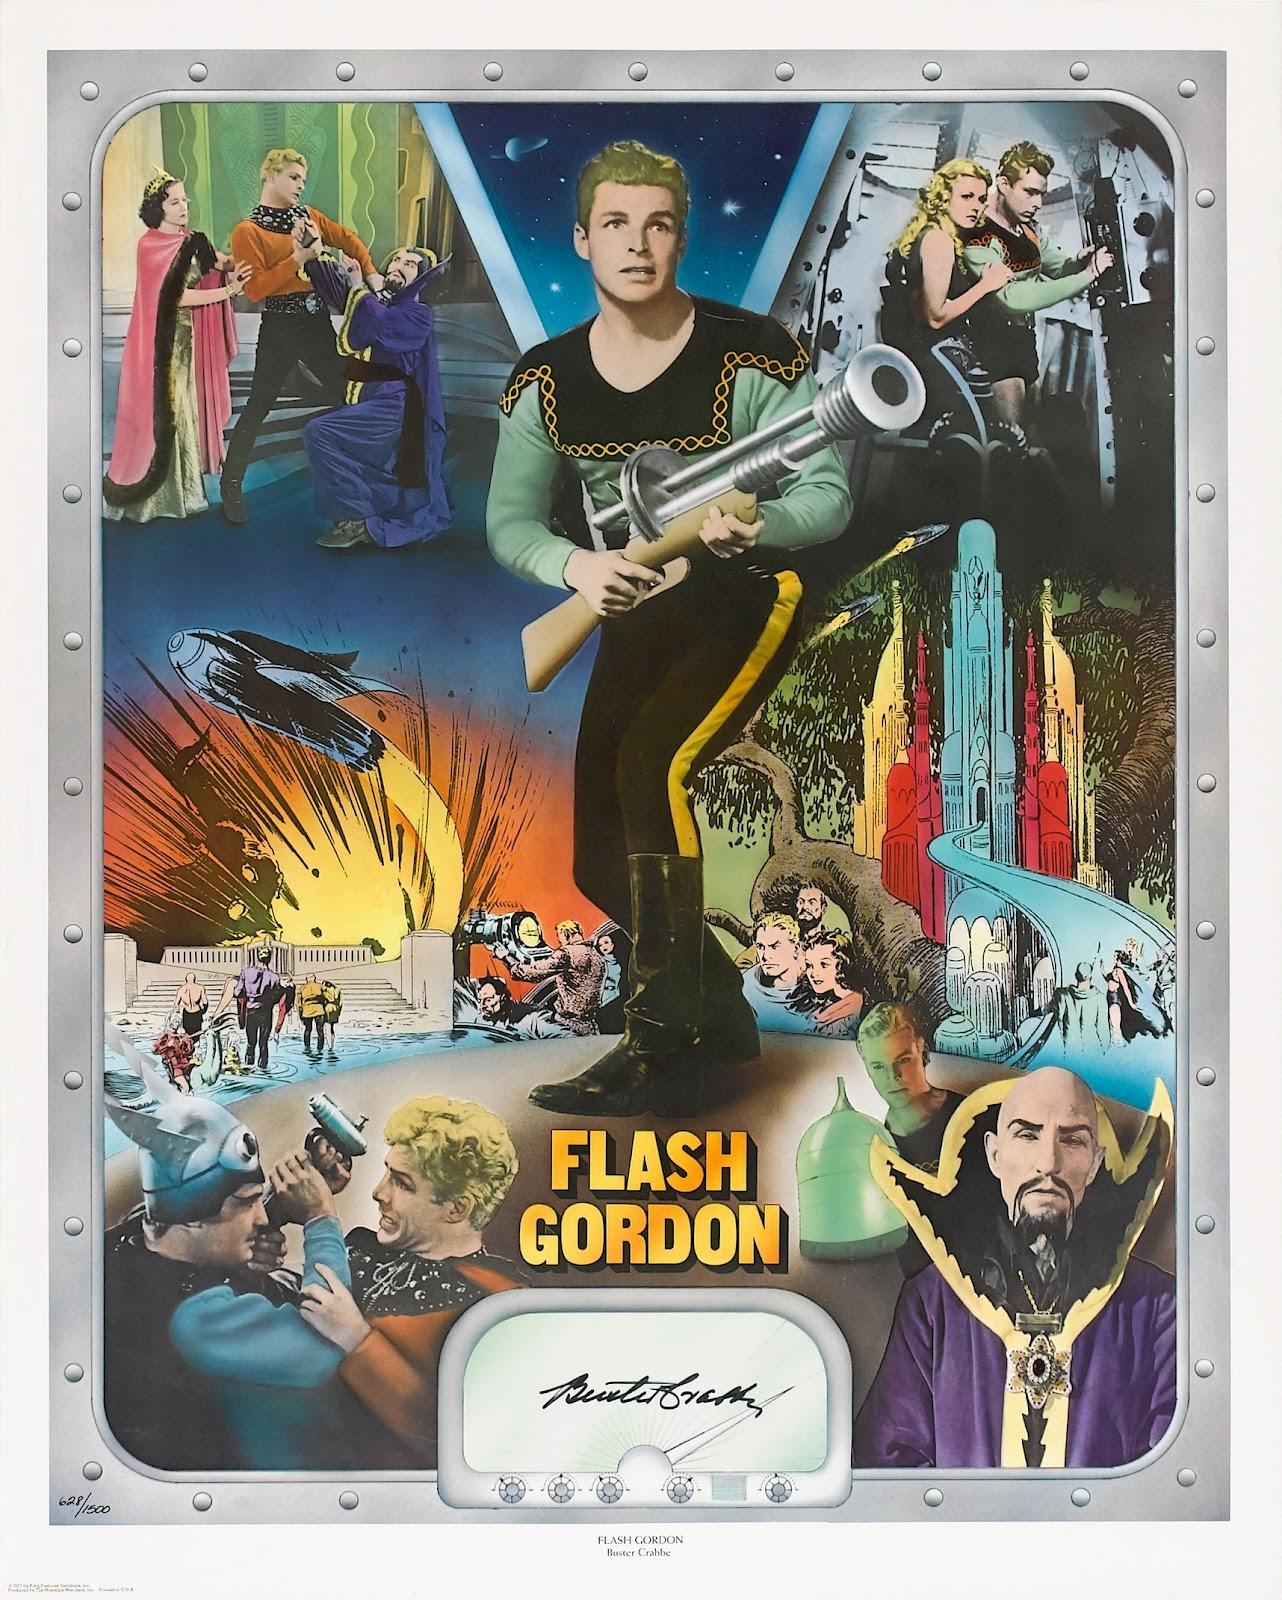 Flash gordon movie poster shop